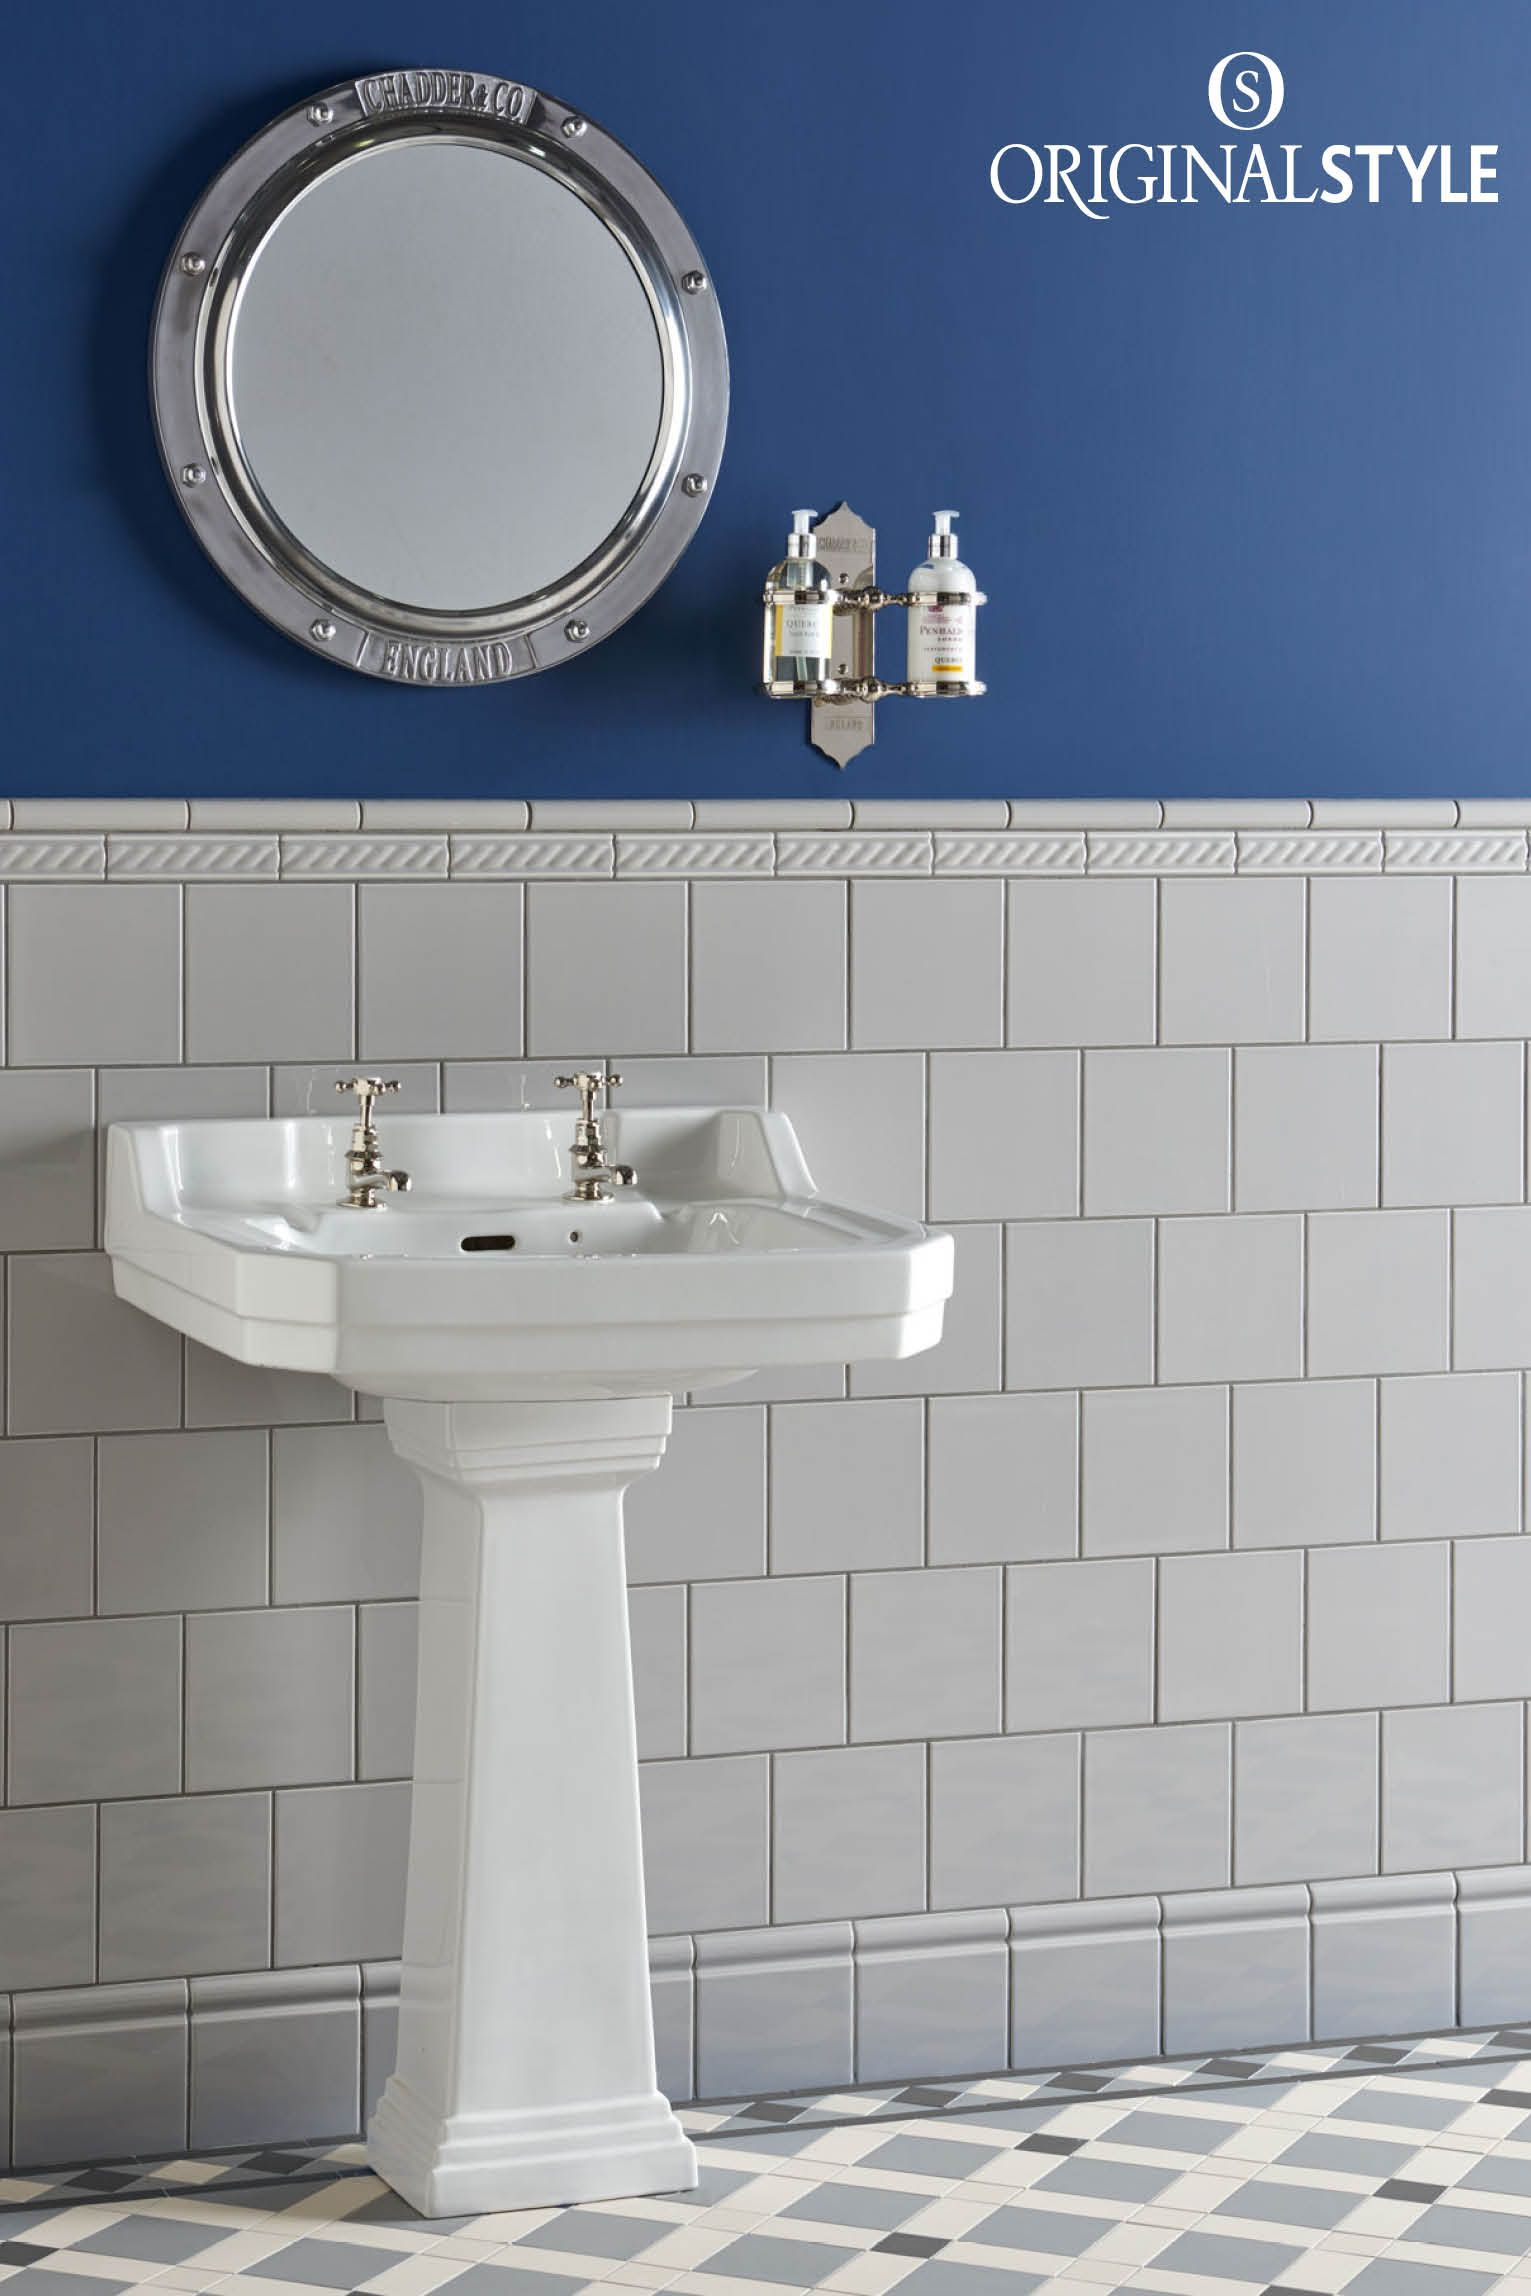 Bathroom skirting ideas - Westminster Grey Field Tile Bathroom Tilingbathroom Ideasart